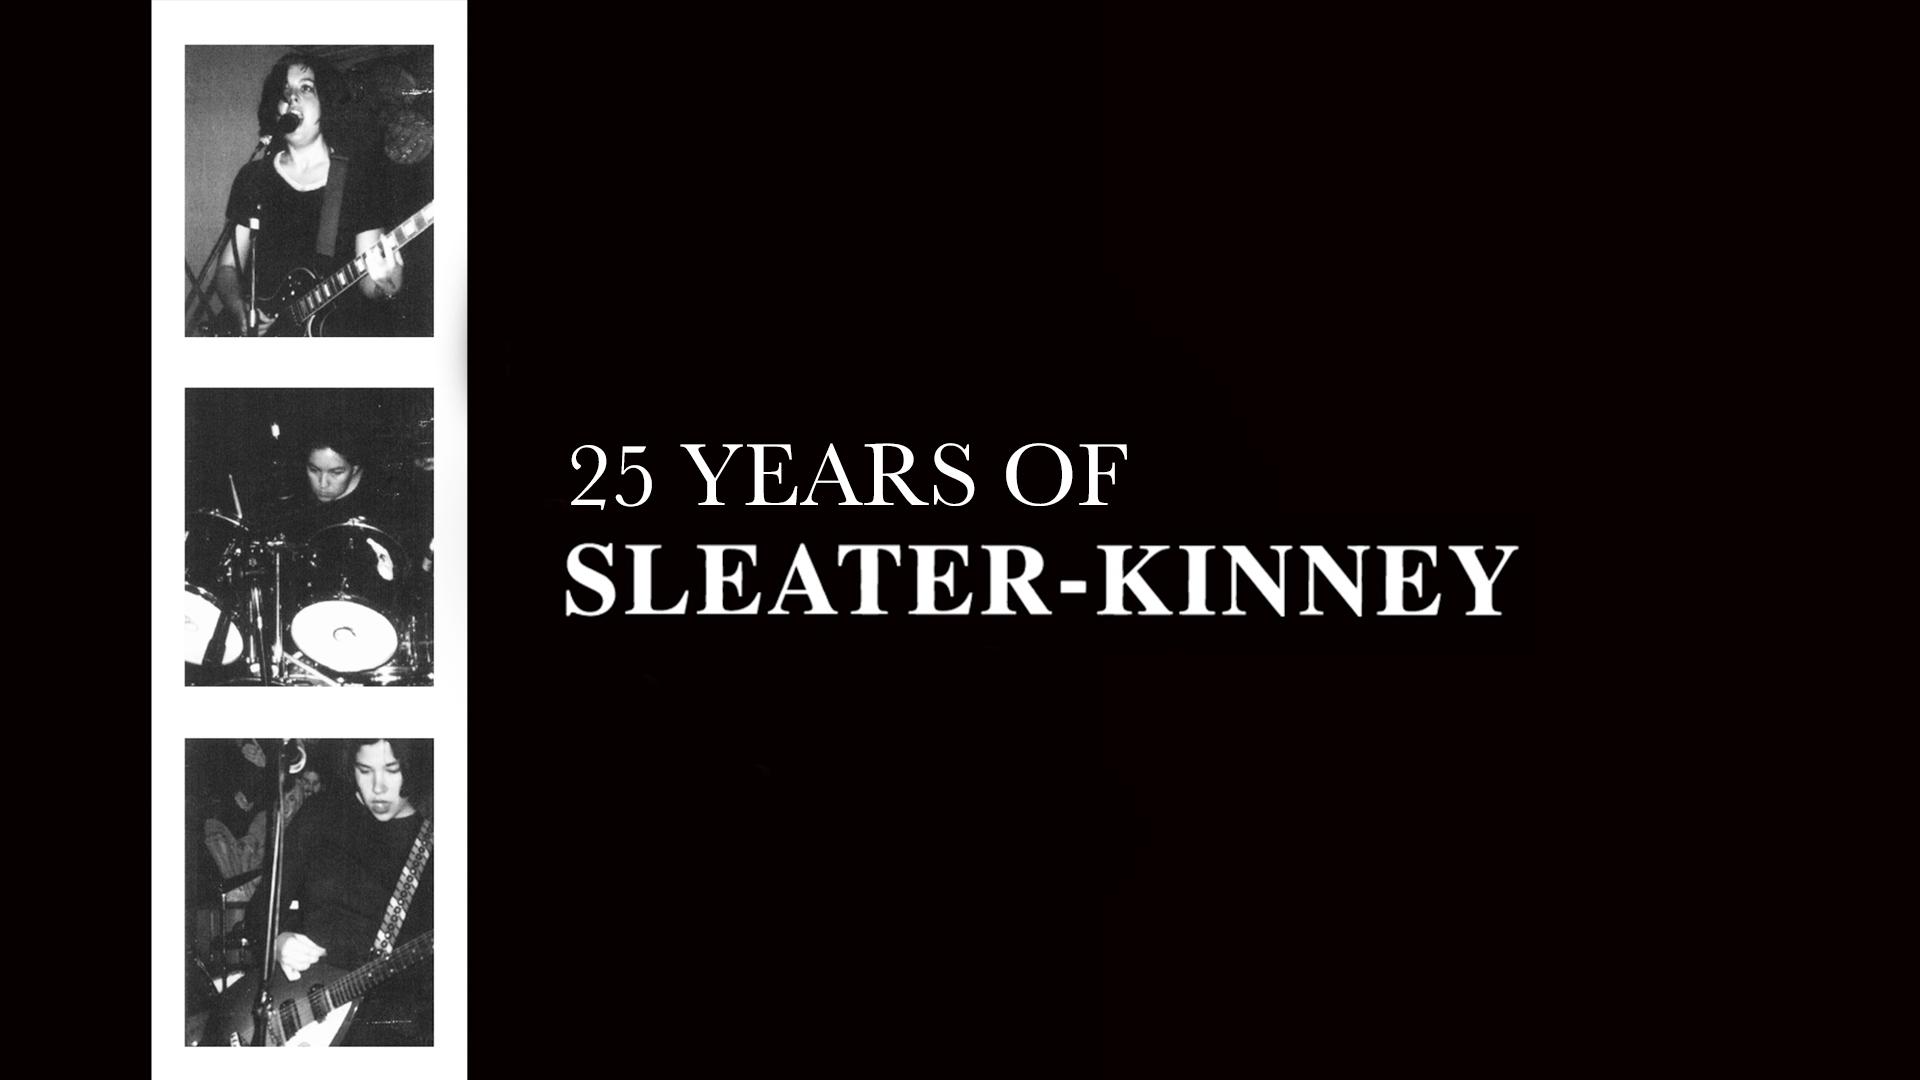 sleater kinney debut album 25th anniversary